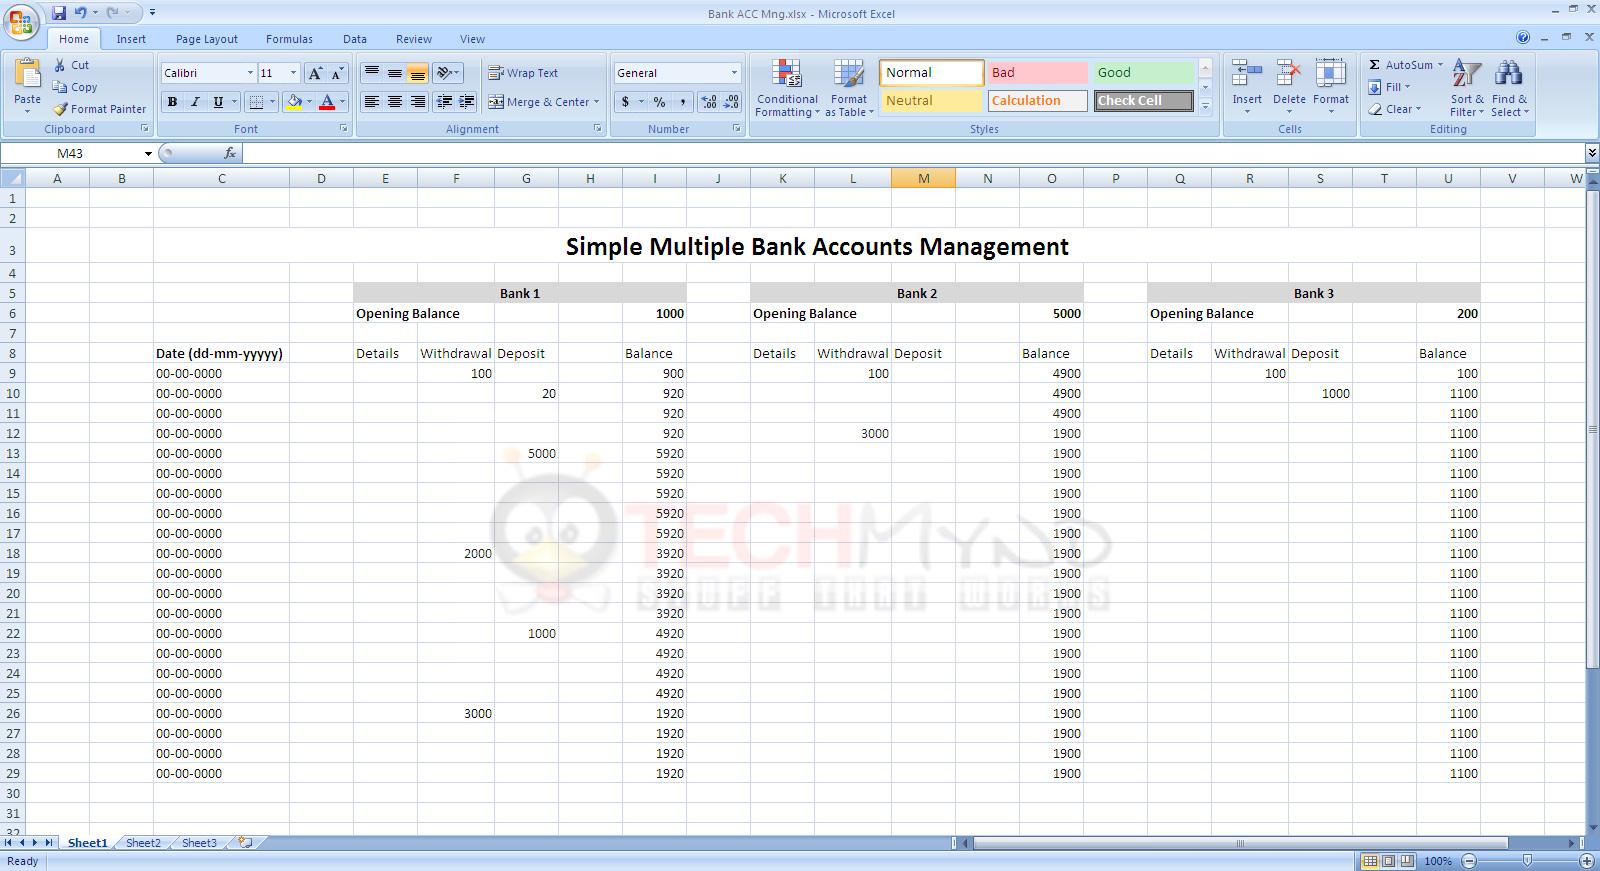 Bank Account Spreadsheet Template Spreadsheet Downloa